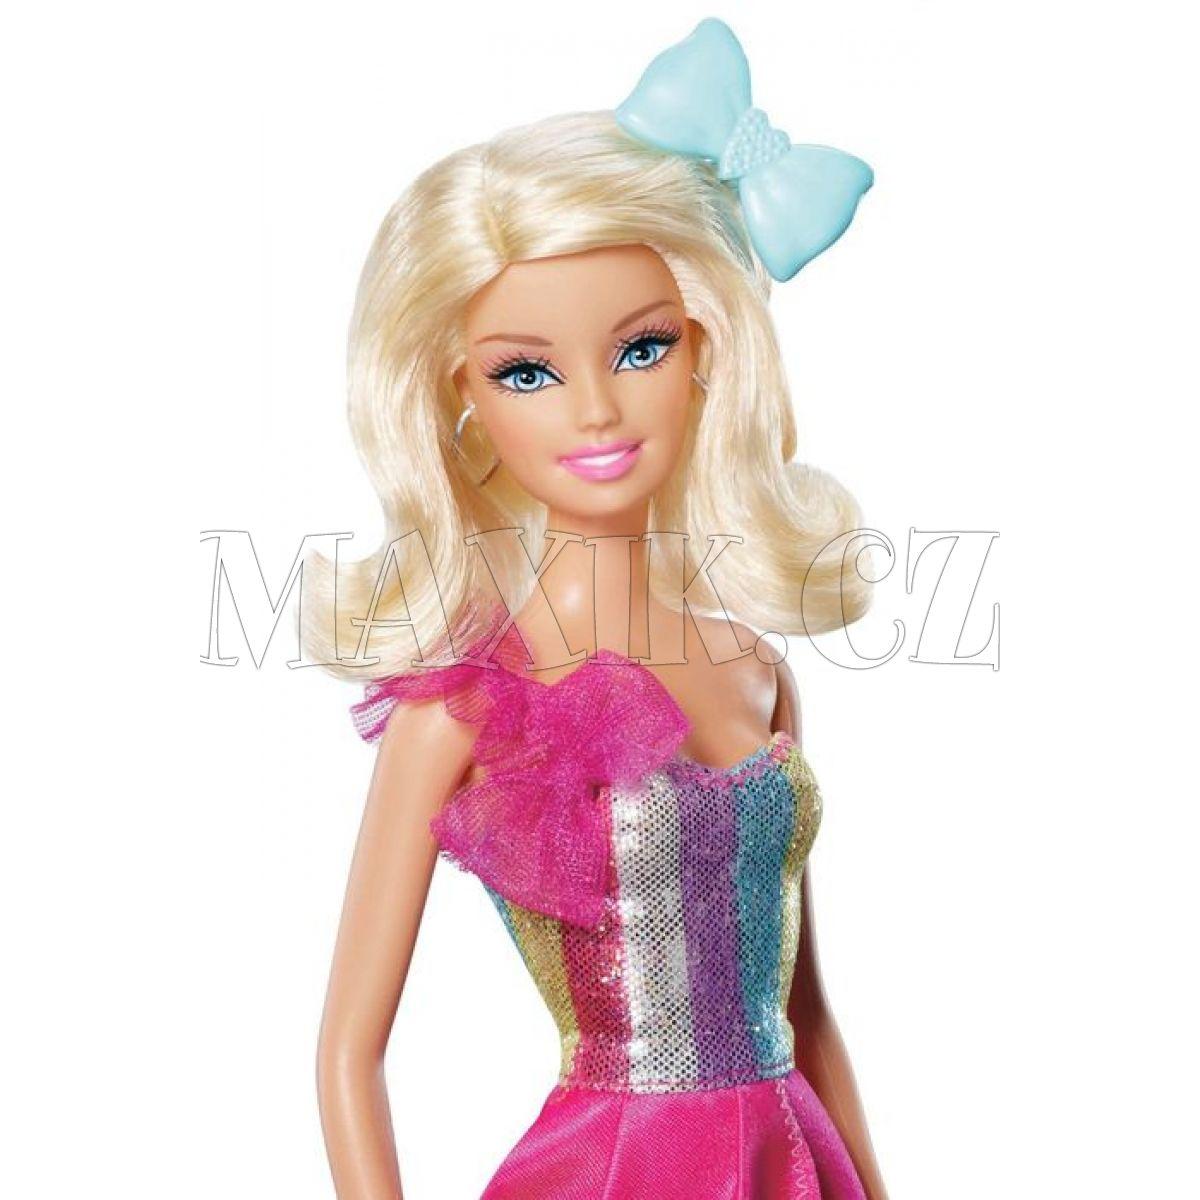 Barbie senza sest ih r ov max kovy hra ky - Barbie senza colore ...